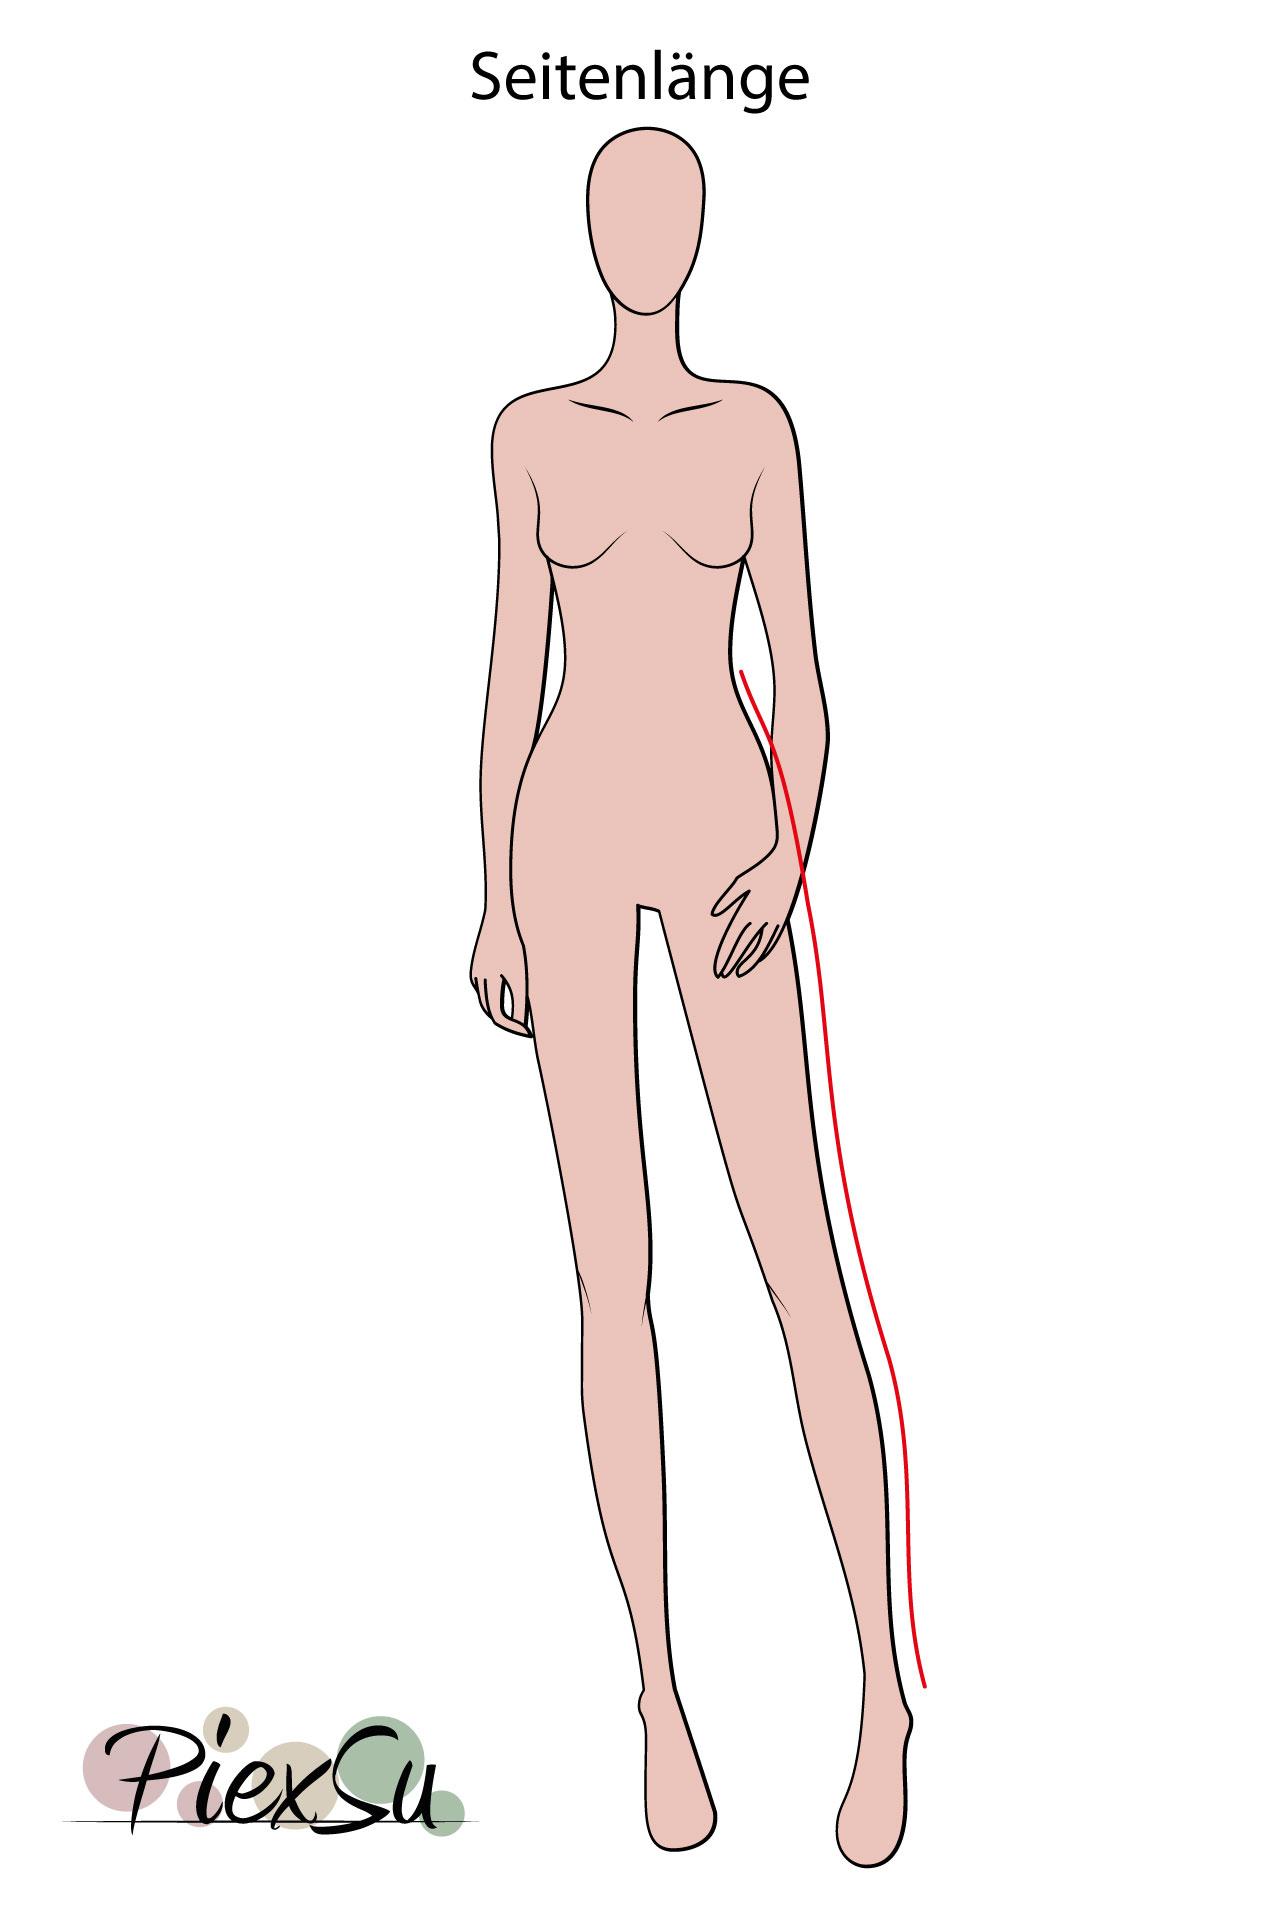 PiexSu-richtig-Maßnehmen-Maße-Schnittmuster-nähen-Schnittmuster-anpassen-messen-Maßband-Seitenlänge